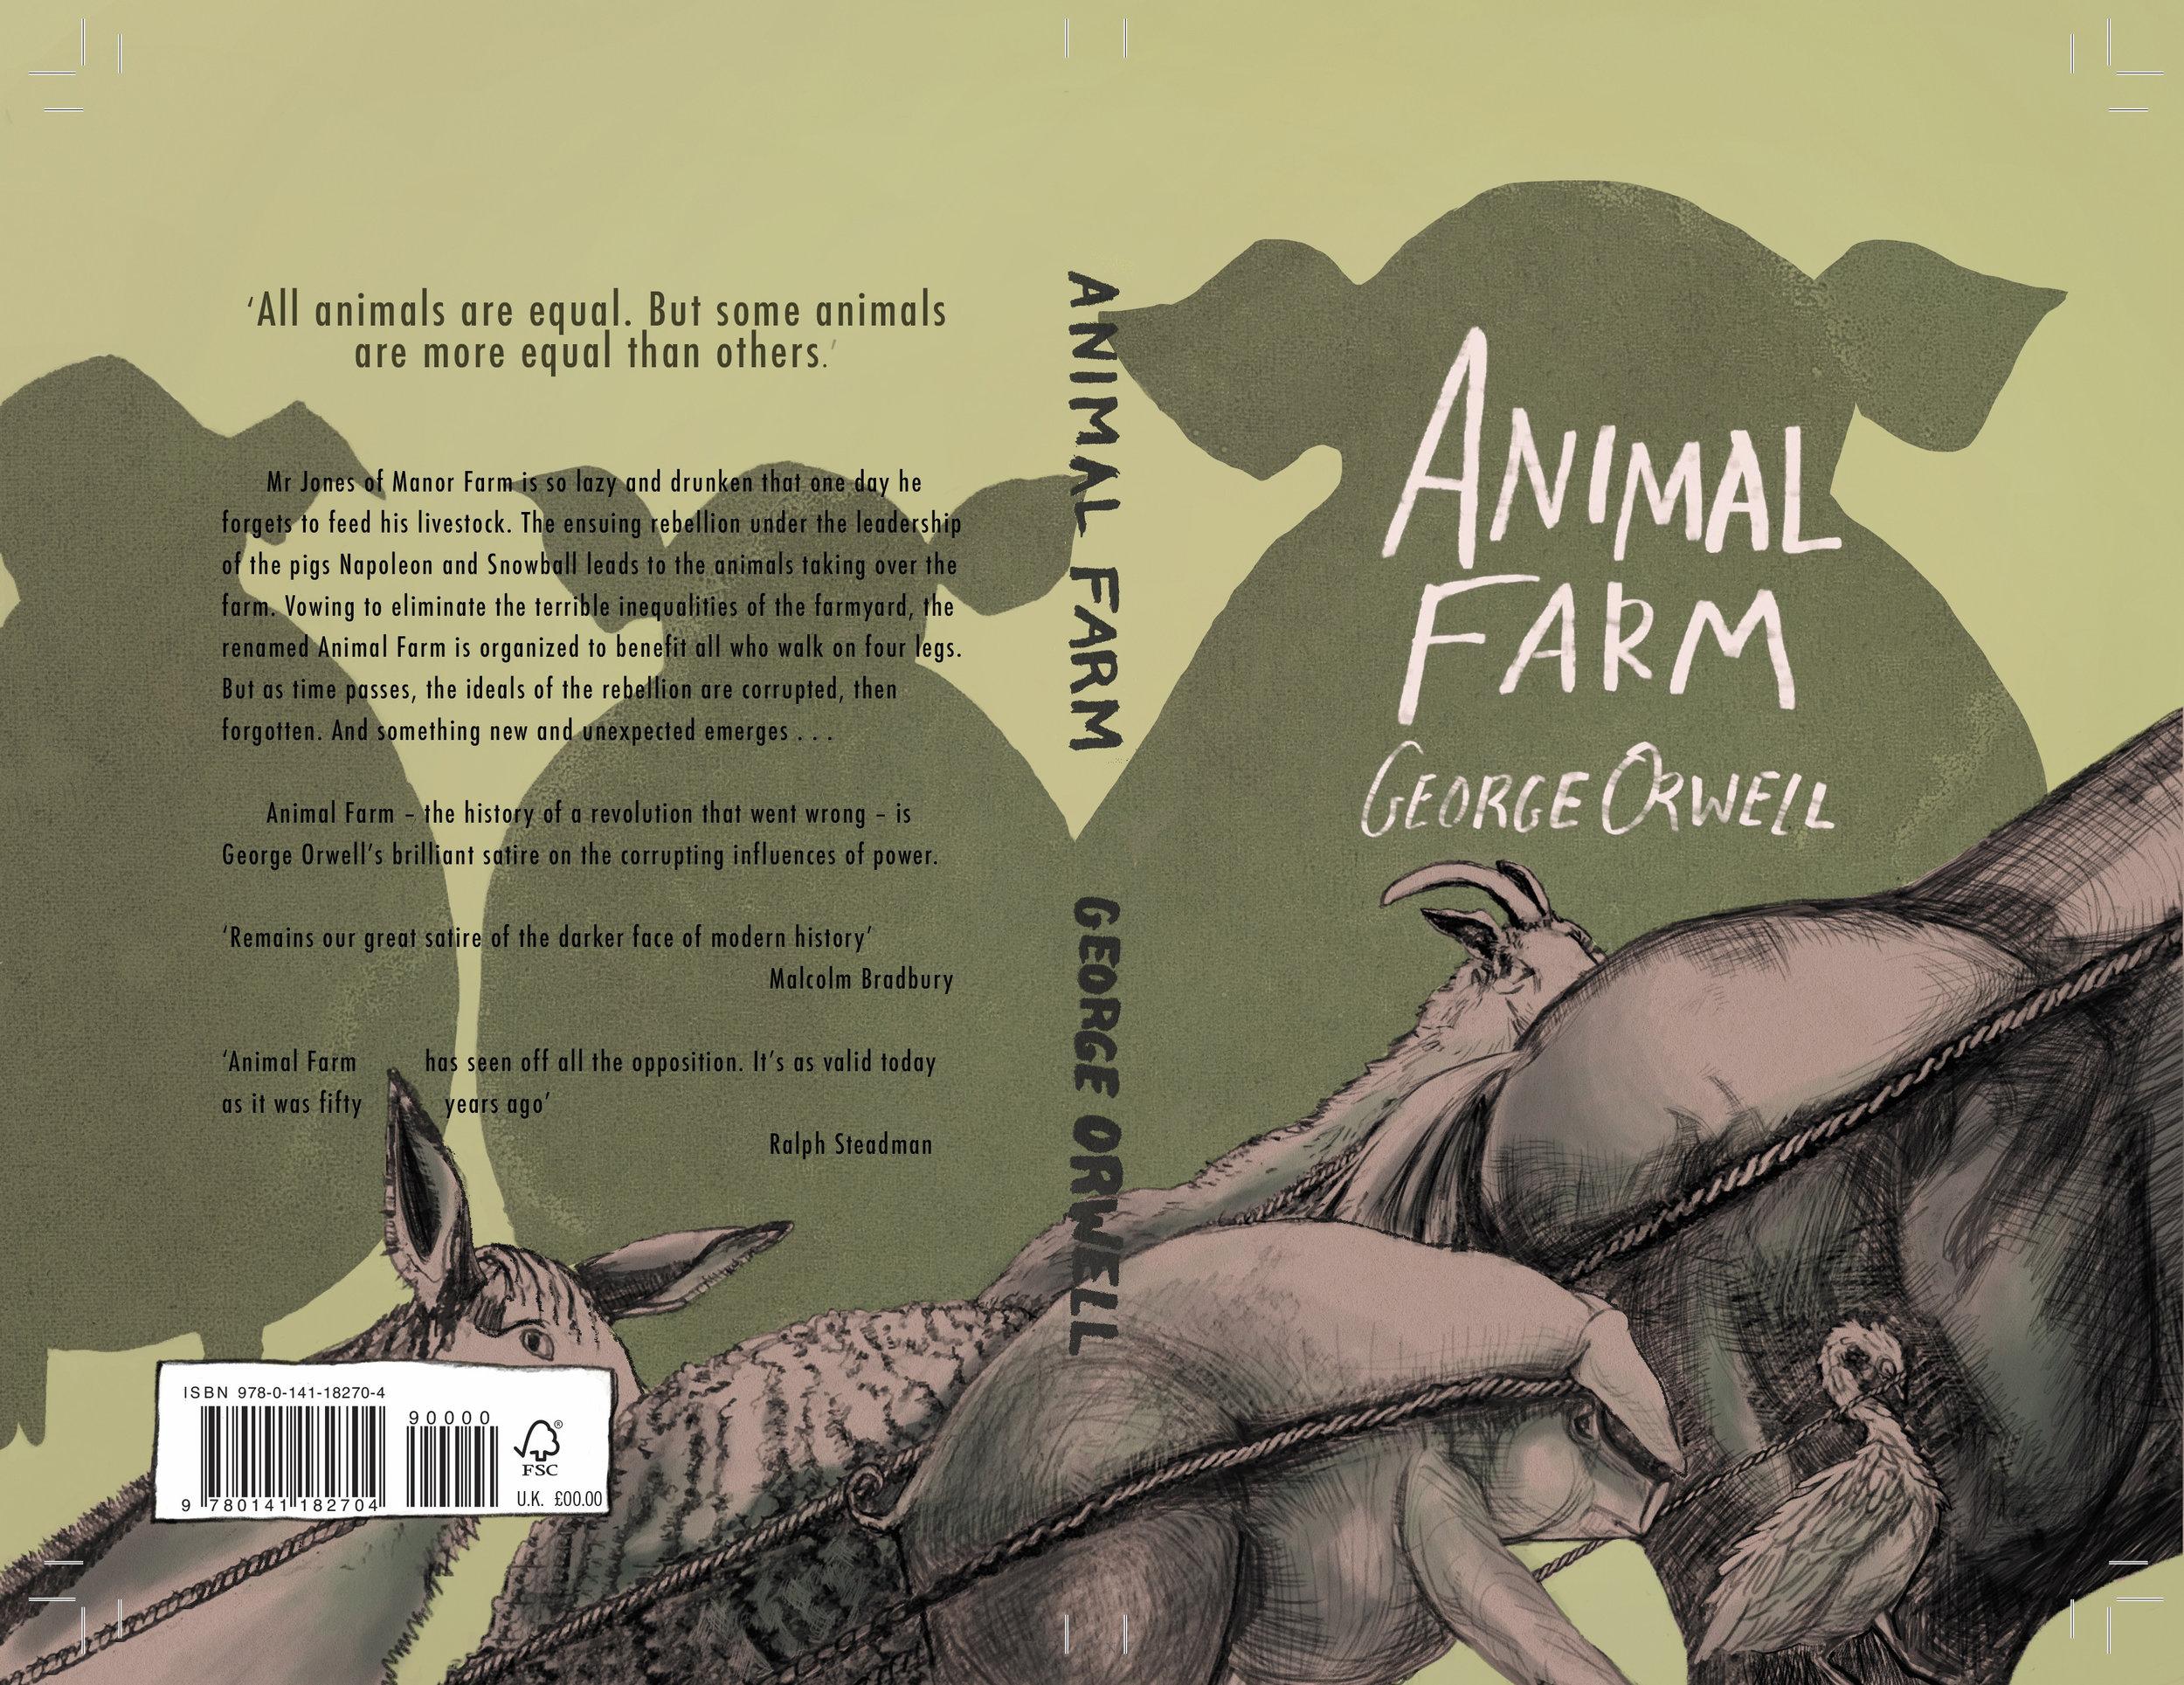 animalfarmcoverforweb.jpg